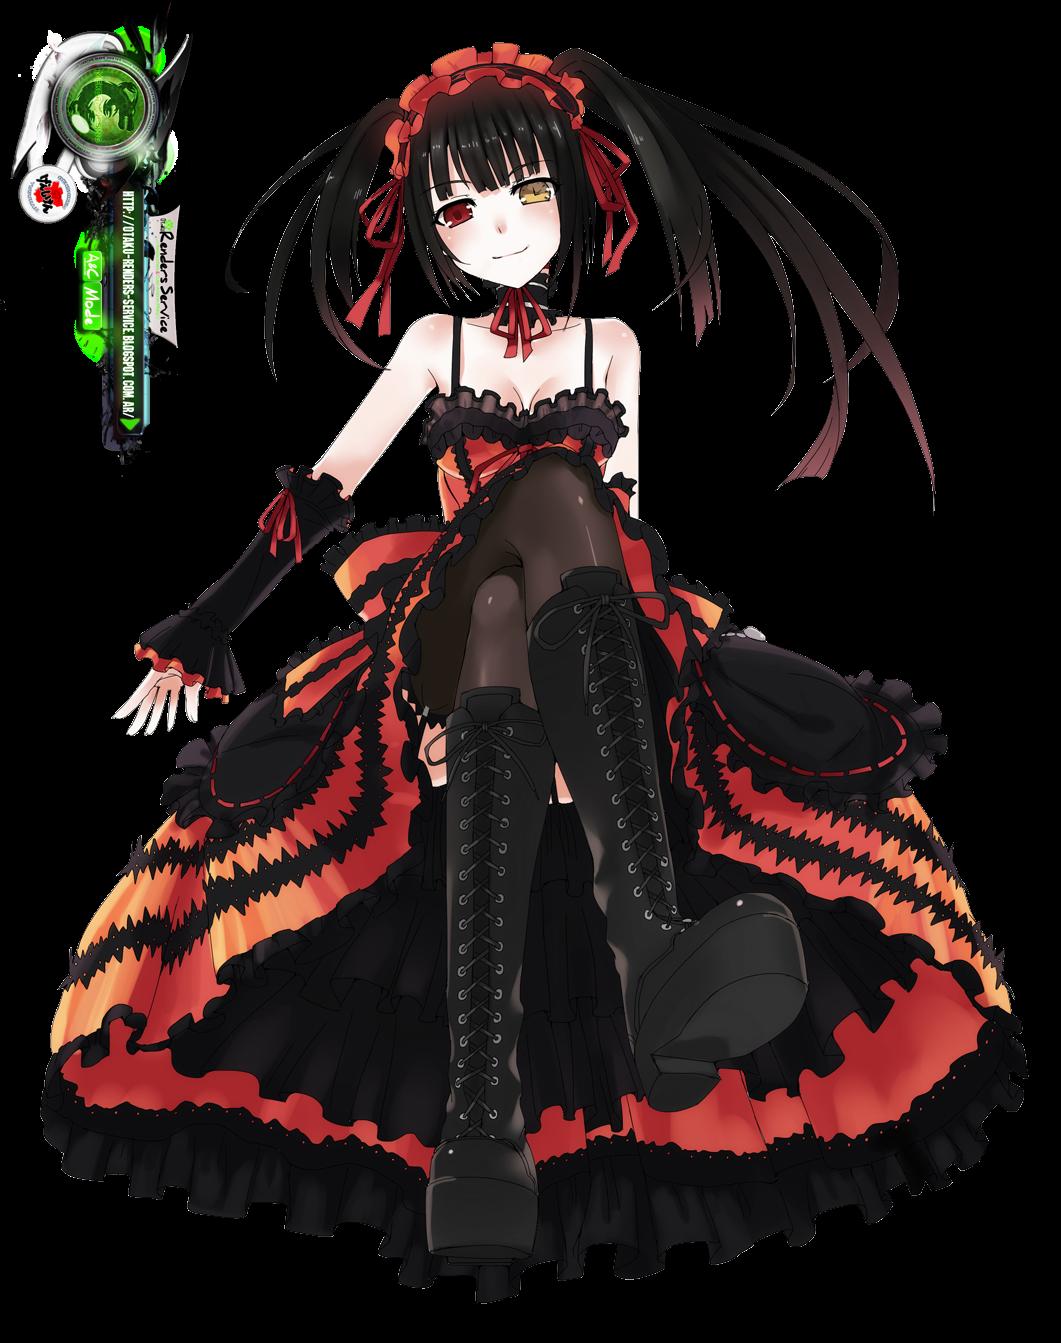 Rya Inertia (Major Wip) 36410490+Tokisaki+Kurumi+Kawaiii+Gothic+Render